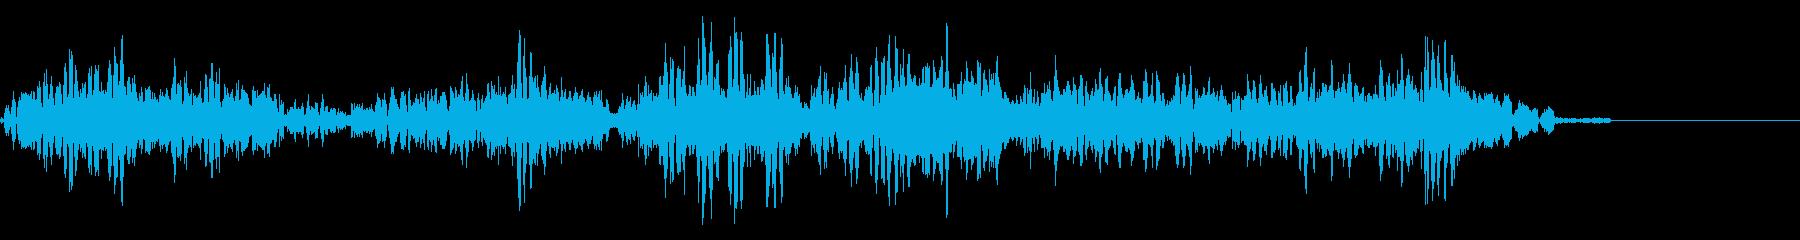 KANT 近未来宇宙人の声効果音1の再生済みの波形